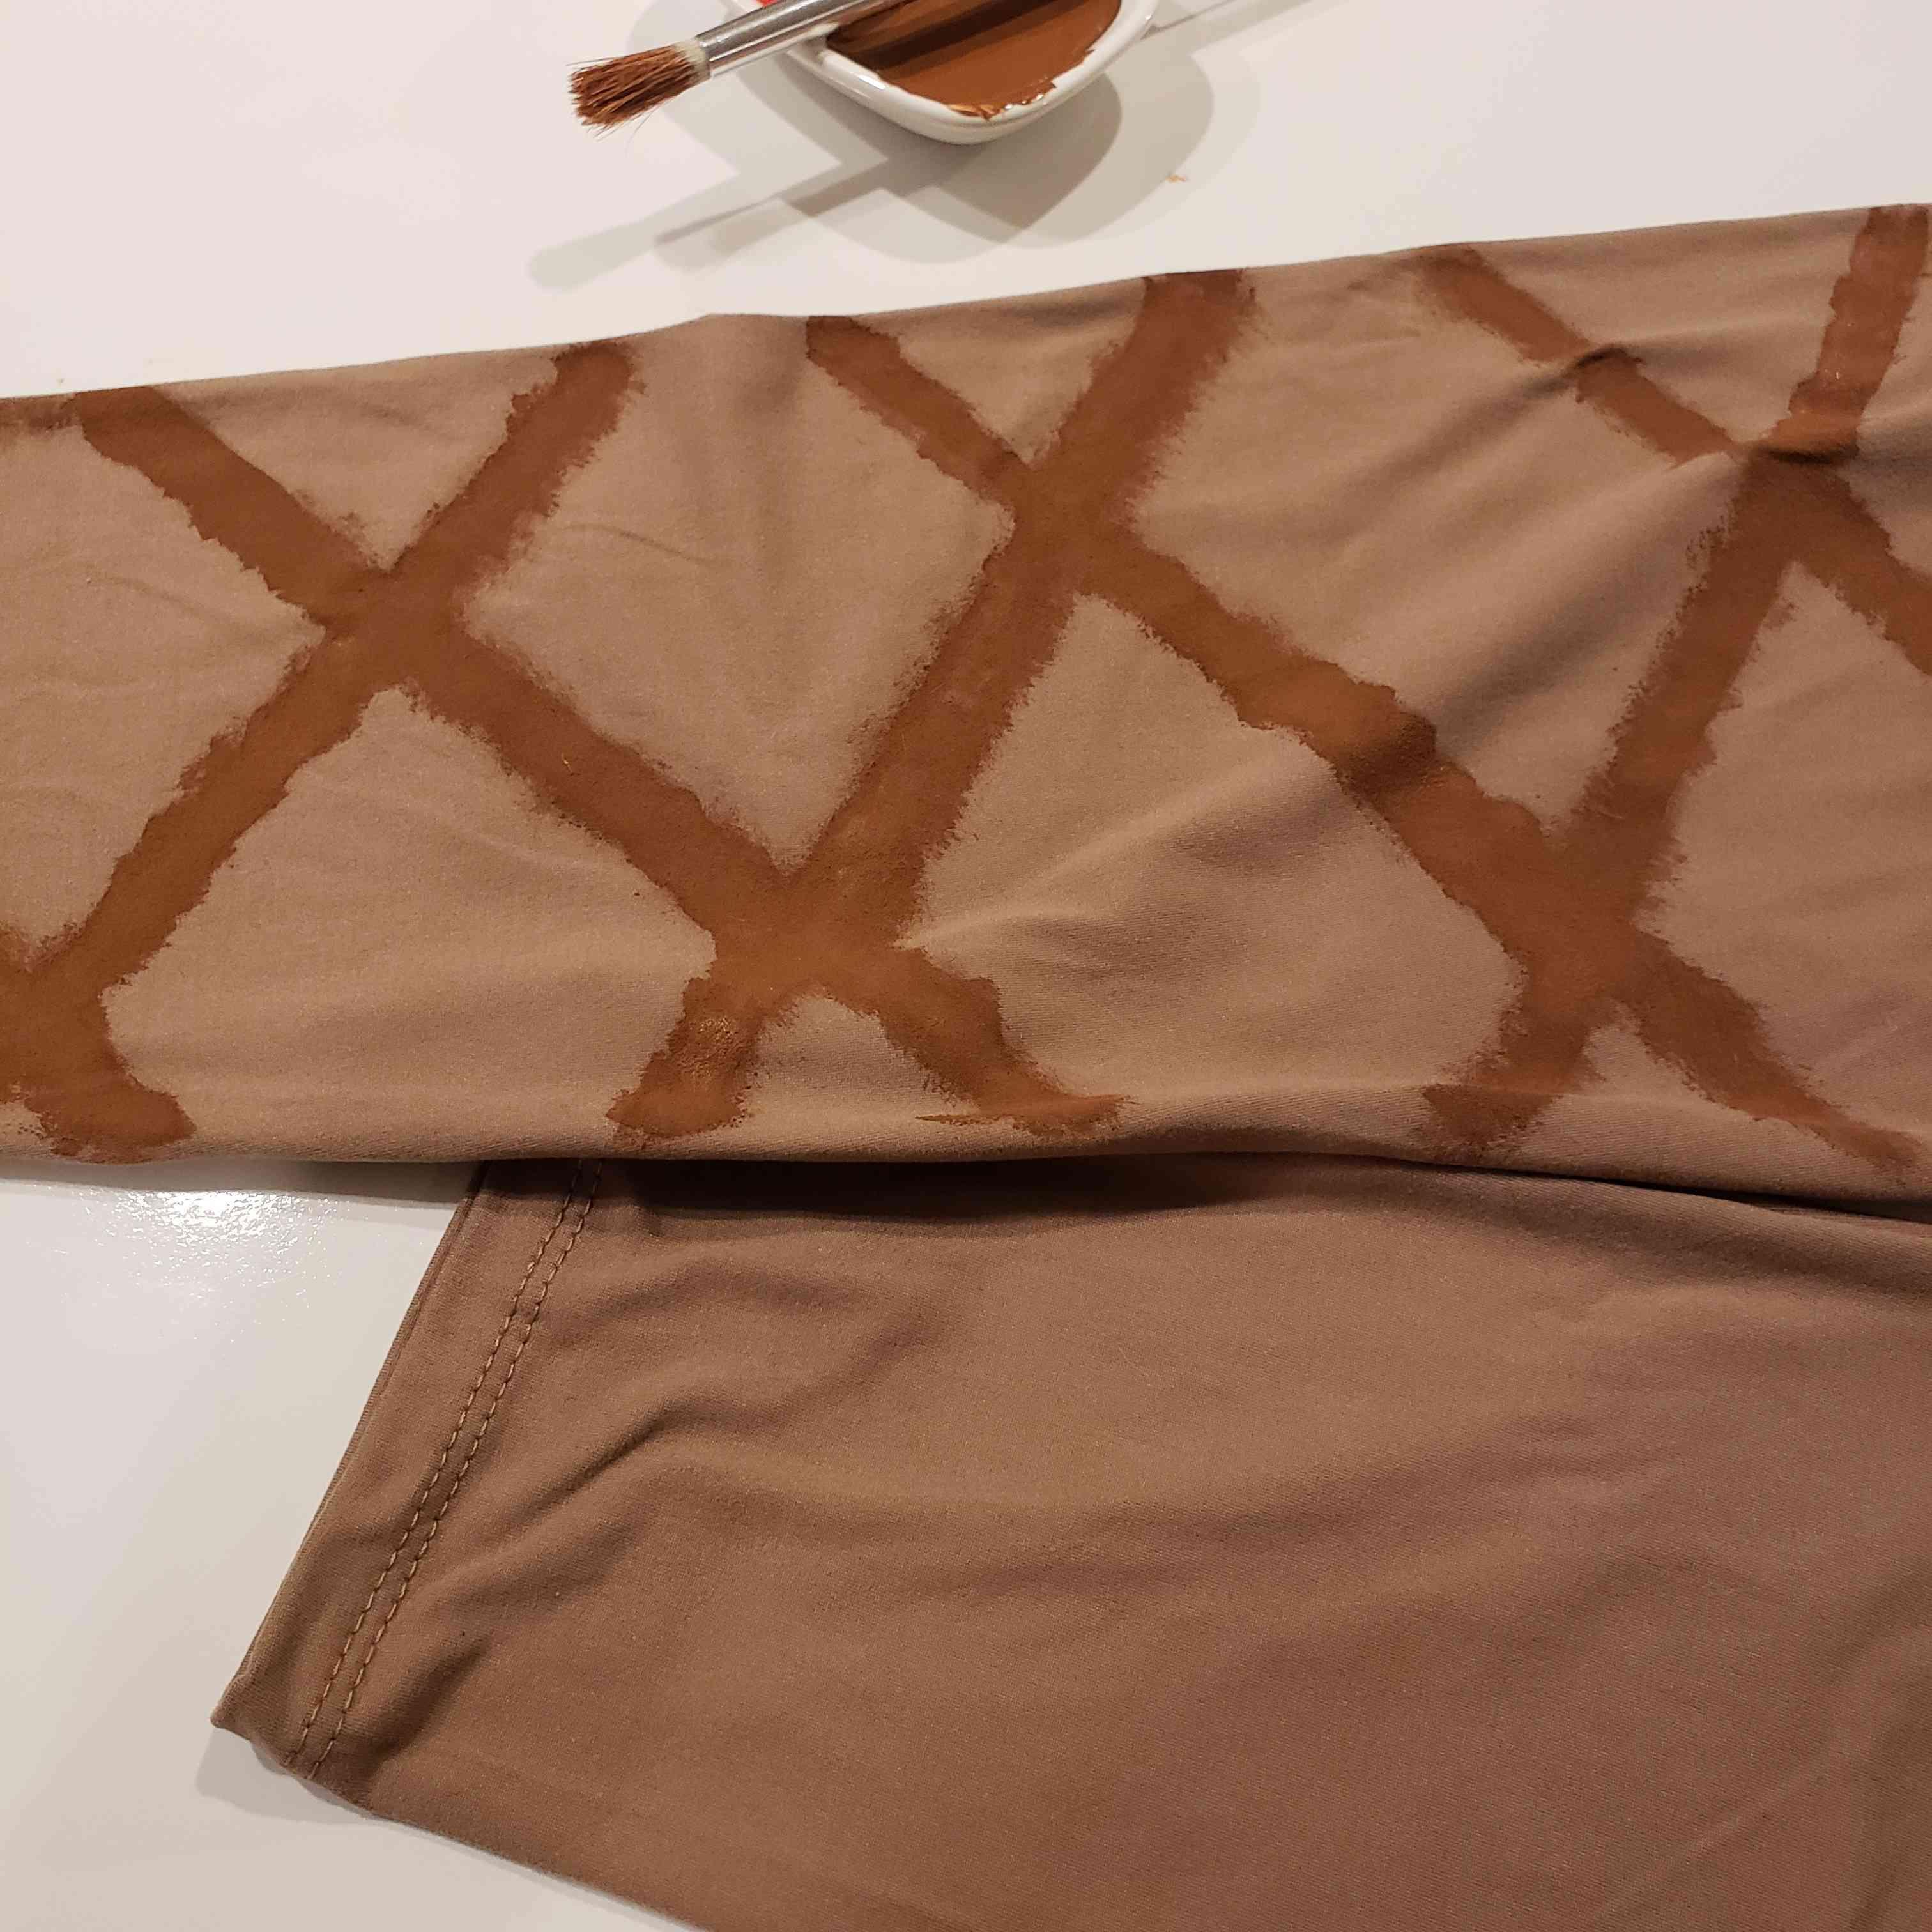 waffle cone leggings